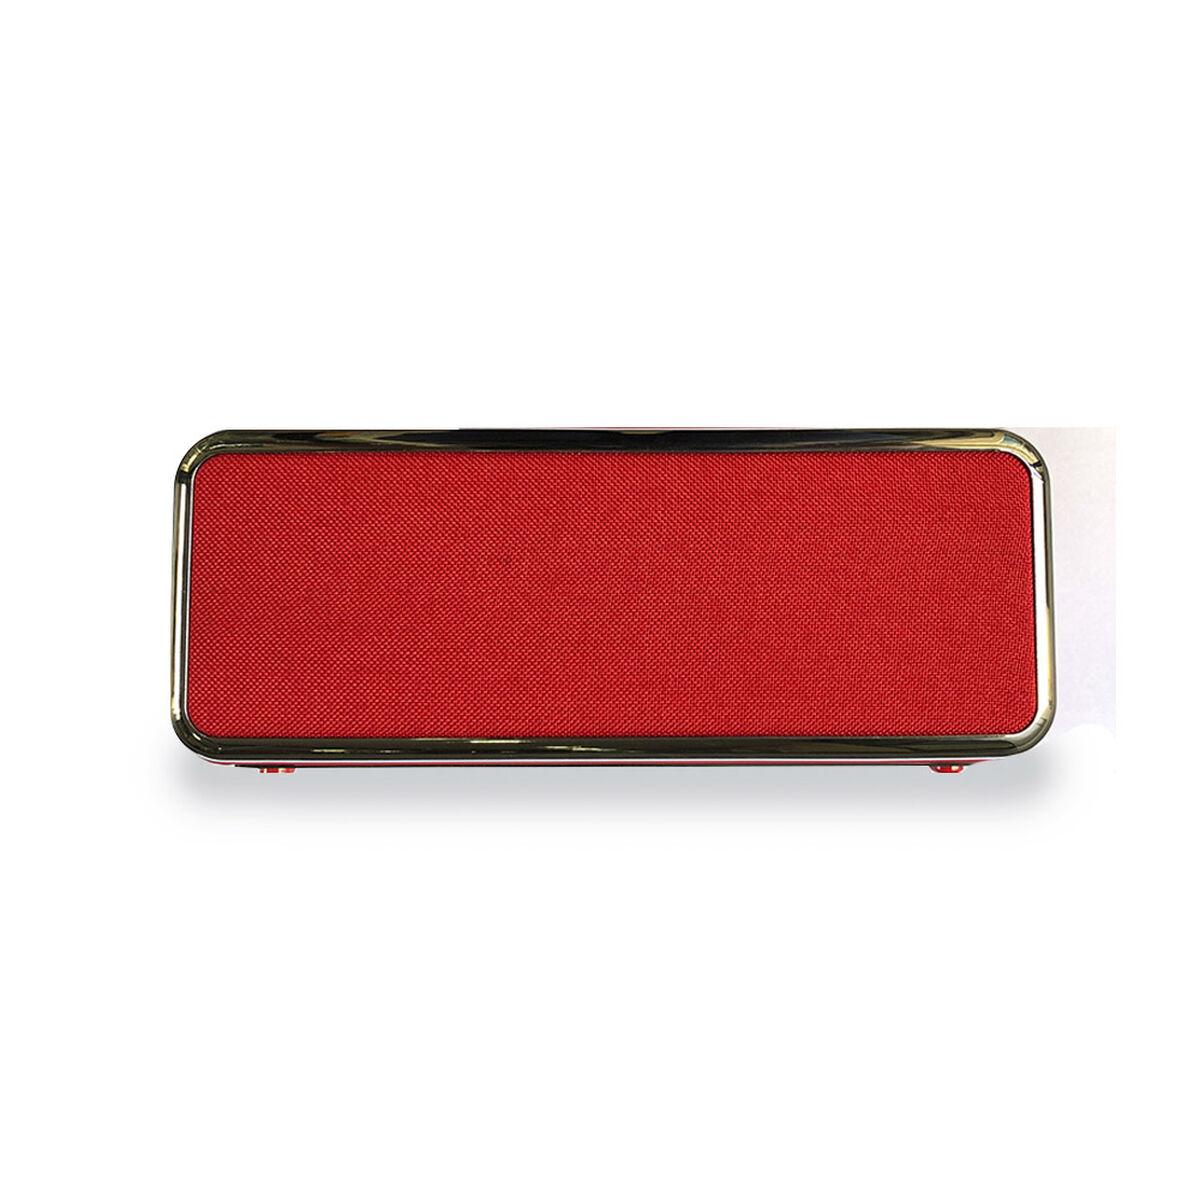 Parlante Bluetooth Lhotse Outdoor TG061 Rojo